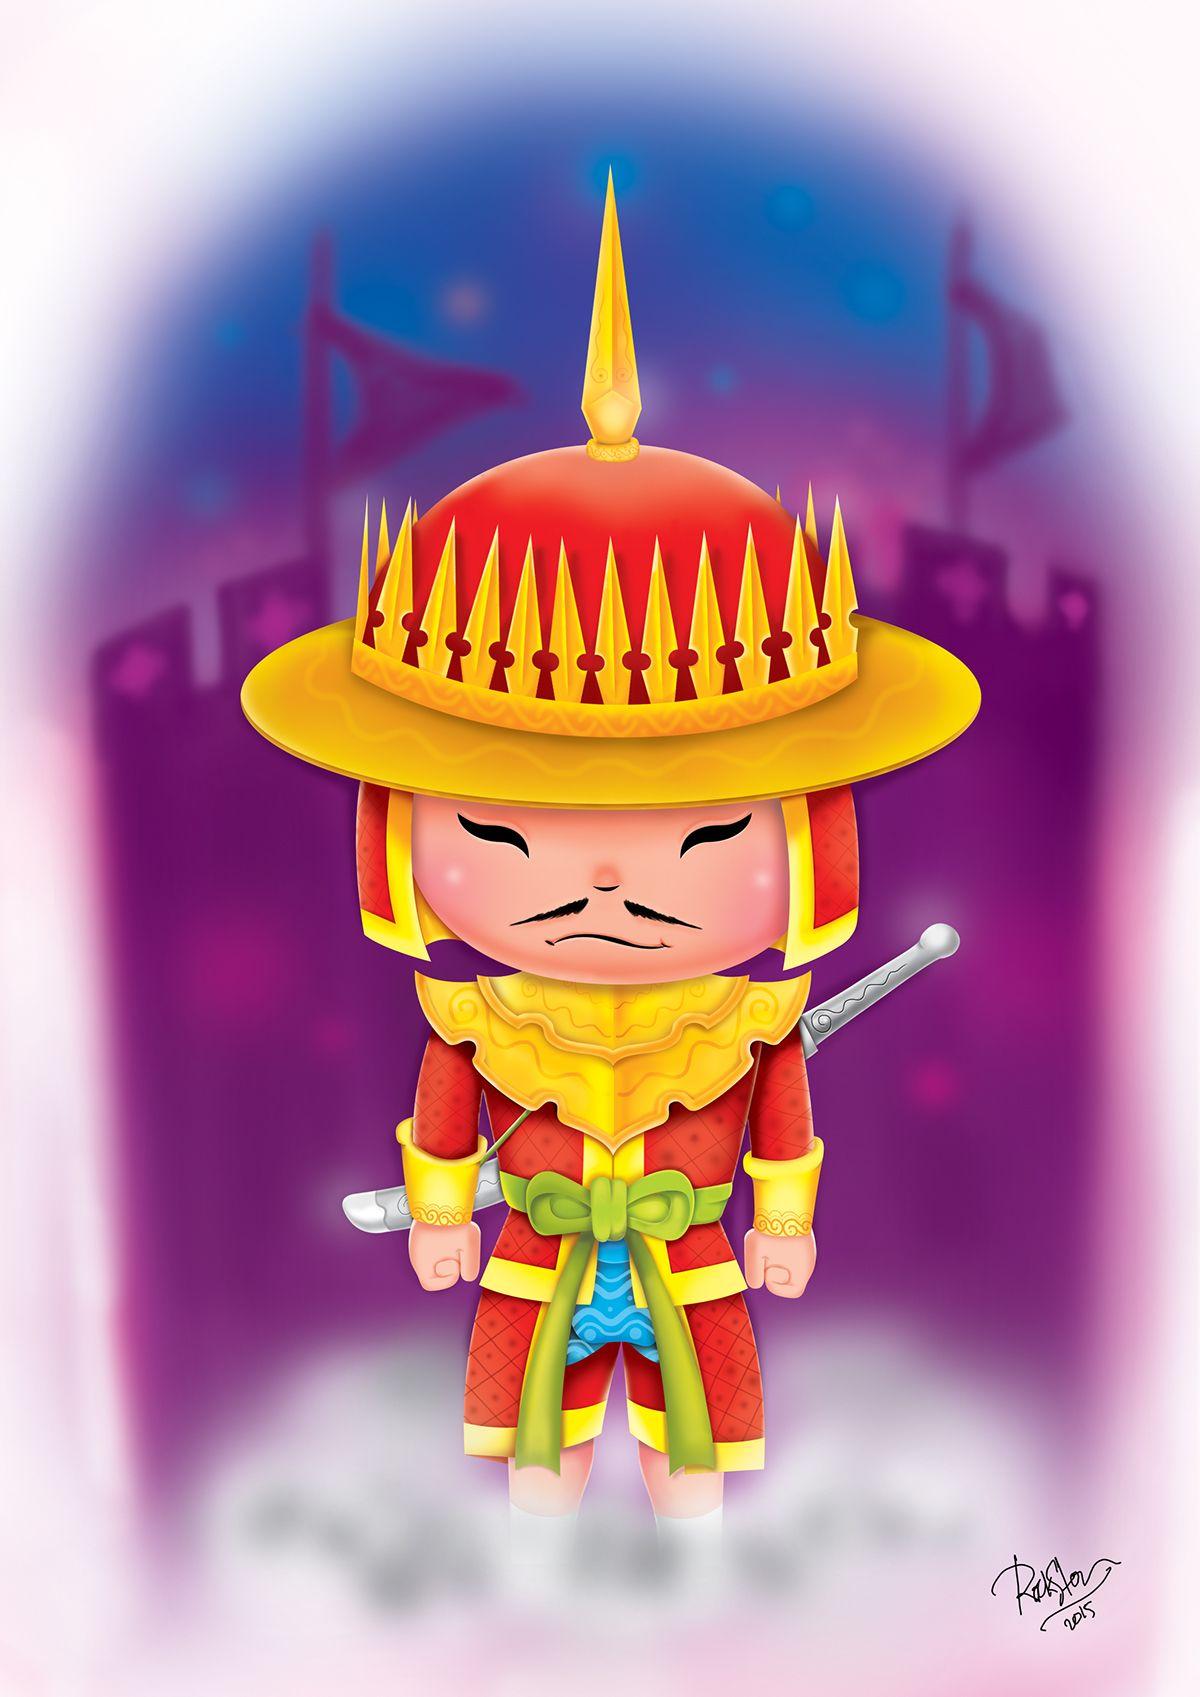 myanmar general on Behance in 2020 Cartoon logo, Cartoon